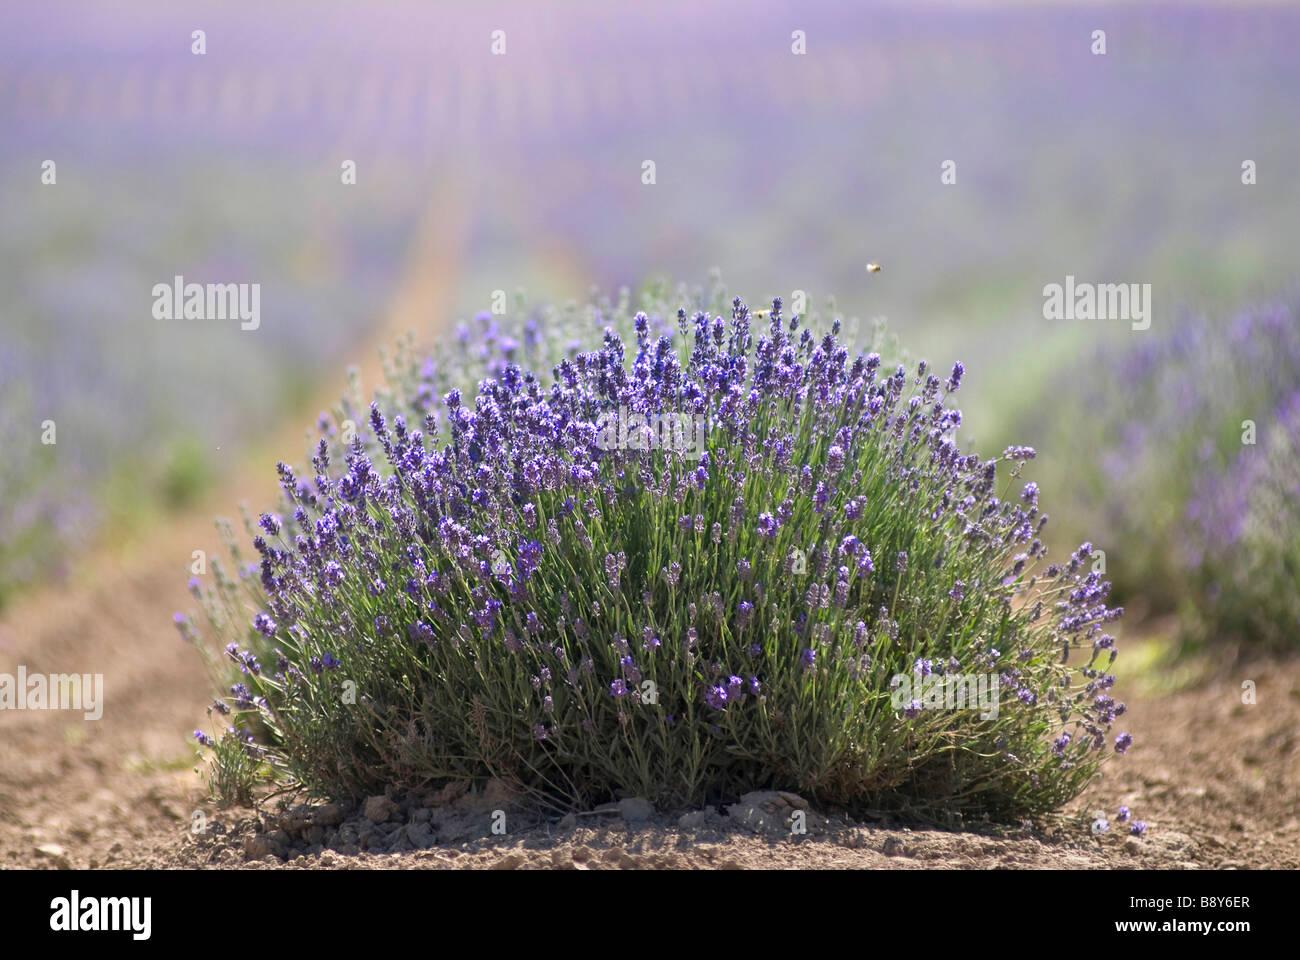 Close-up of lavenders bush, Utah, USA - Stock Image